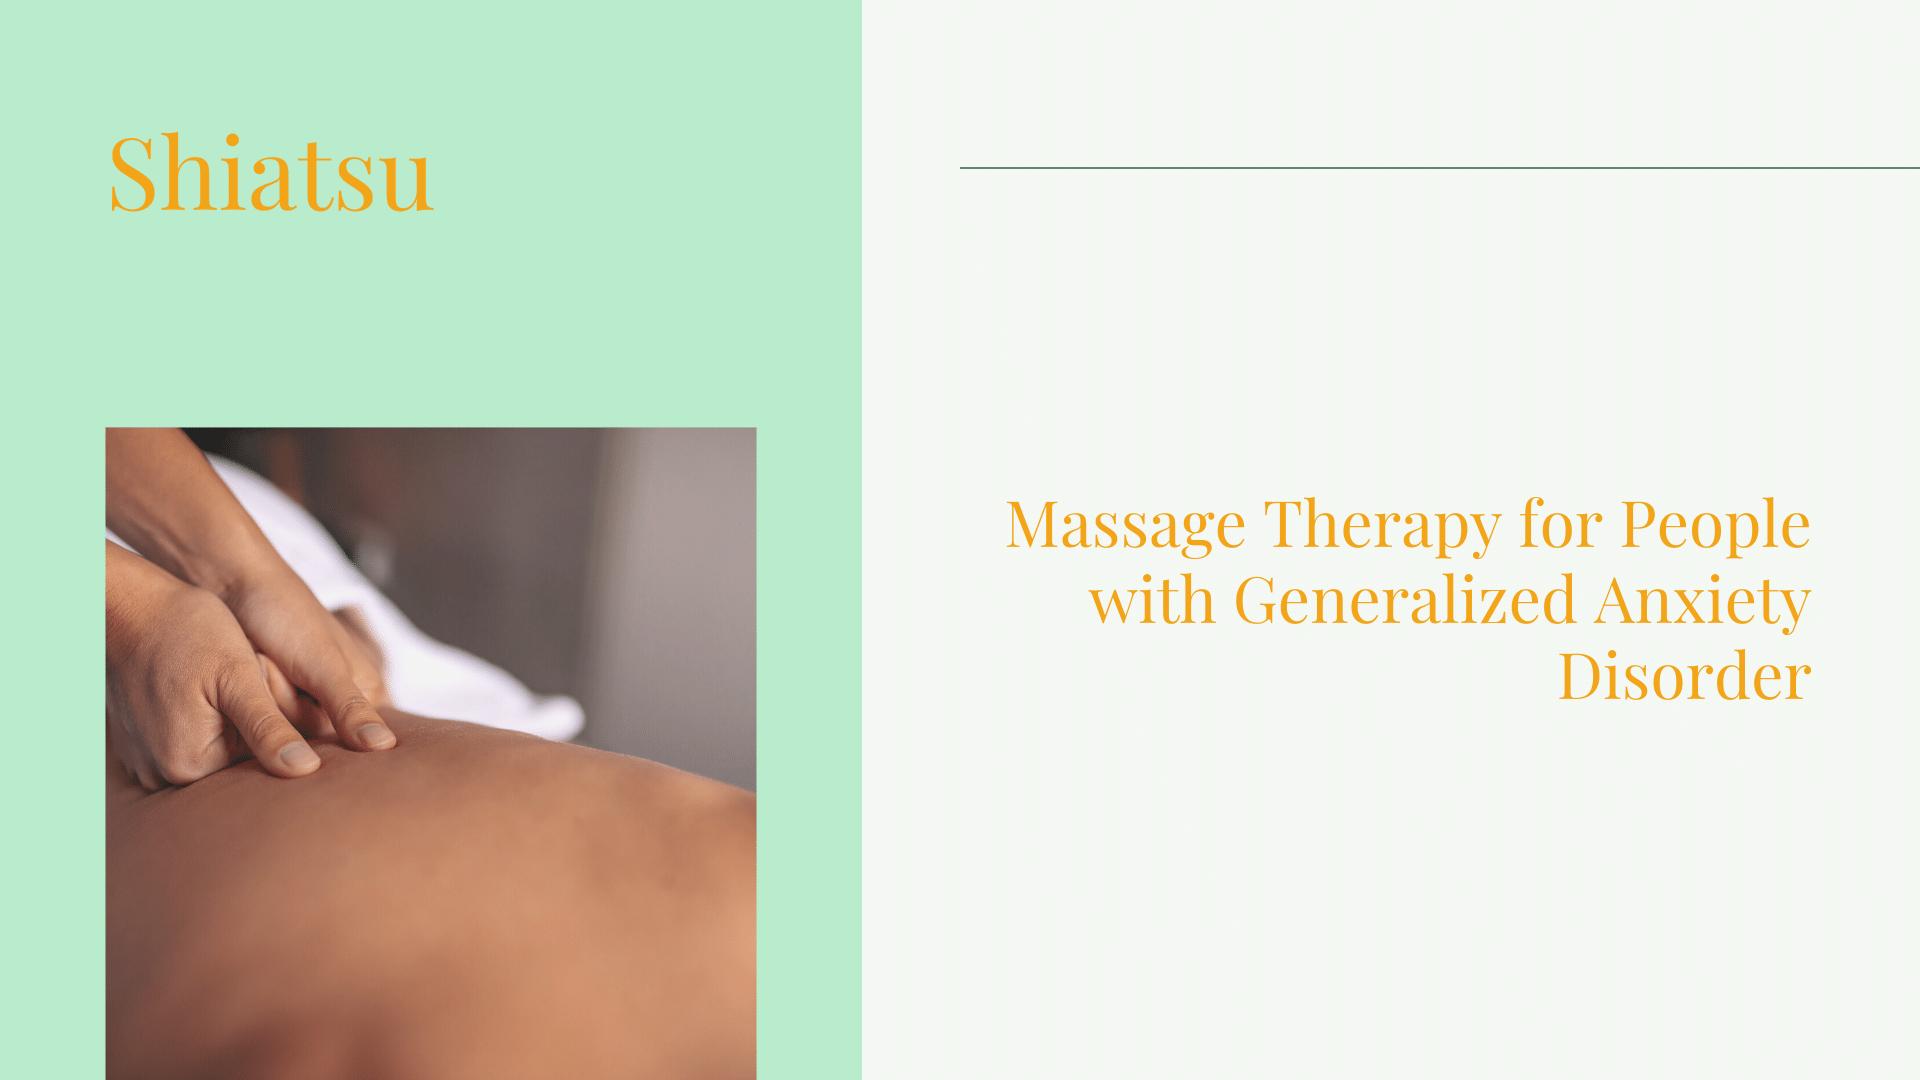 massage therapy for generalized anxiety disorder shiatsu